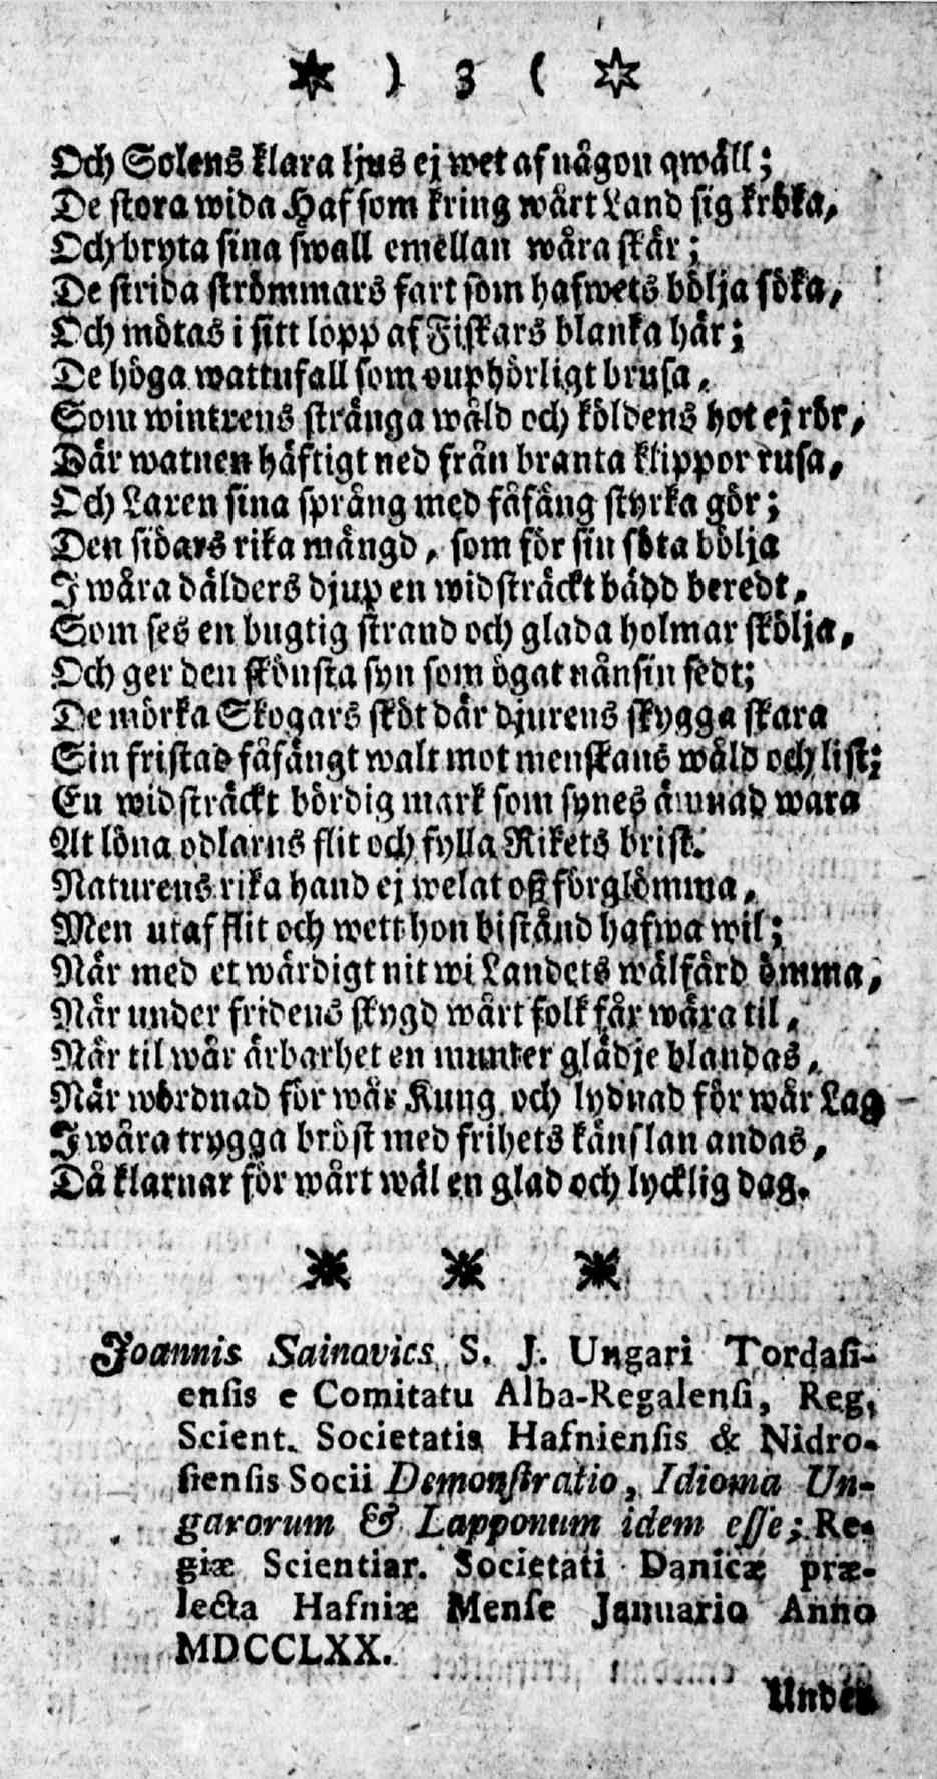 Tidningar Utgifne af et Sällskap i Åbo, 15.01.1771, nro 1, sivu 3